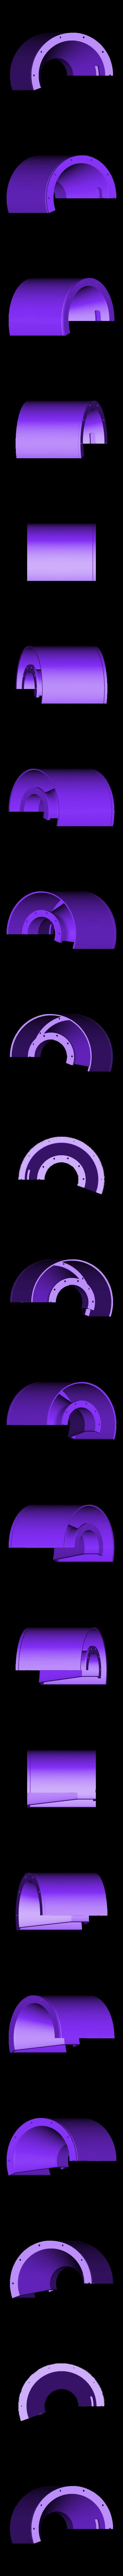 Interm-Case01ws.stl Download free STL file Turboprop Engine Modified Parts (No.2) • 3D printable design, konchan77